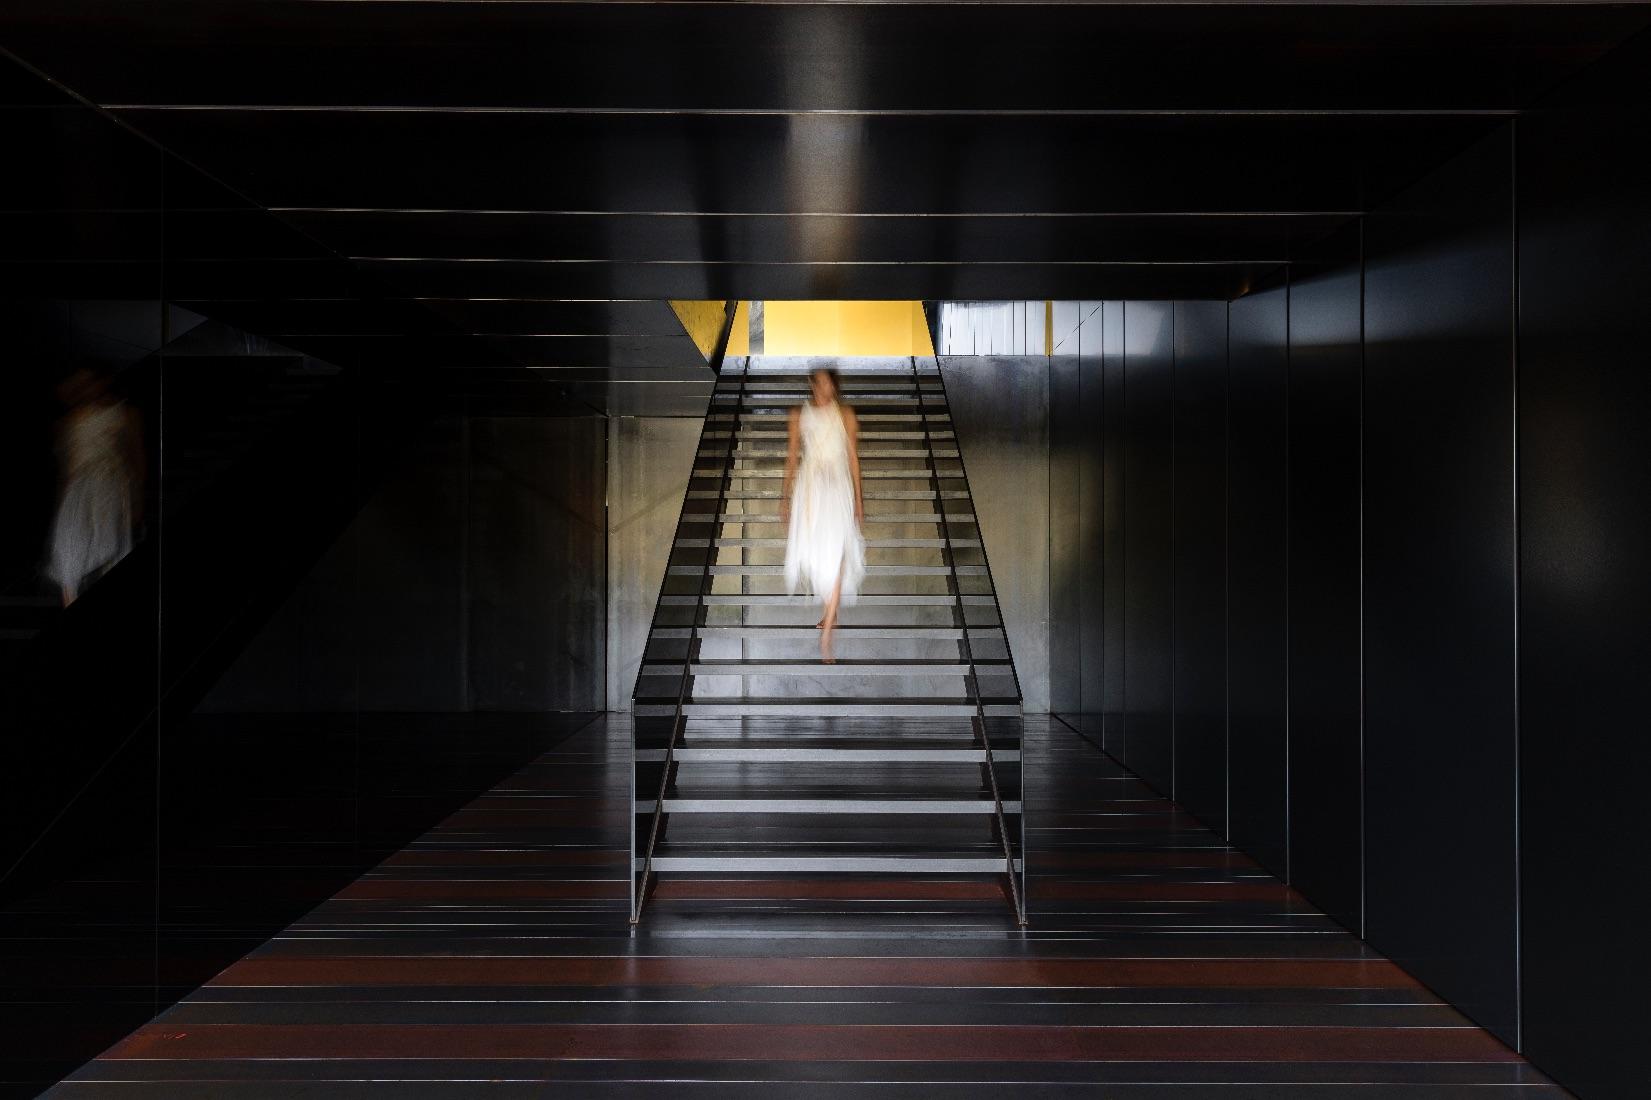 17_MMV Arquitectos_Suspended Matter Box_Inspirationist